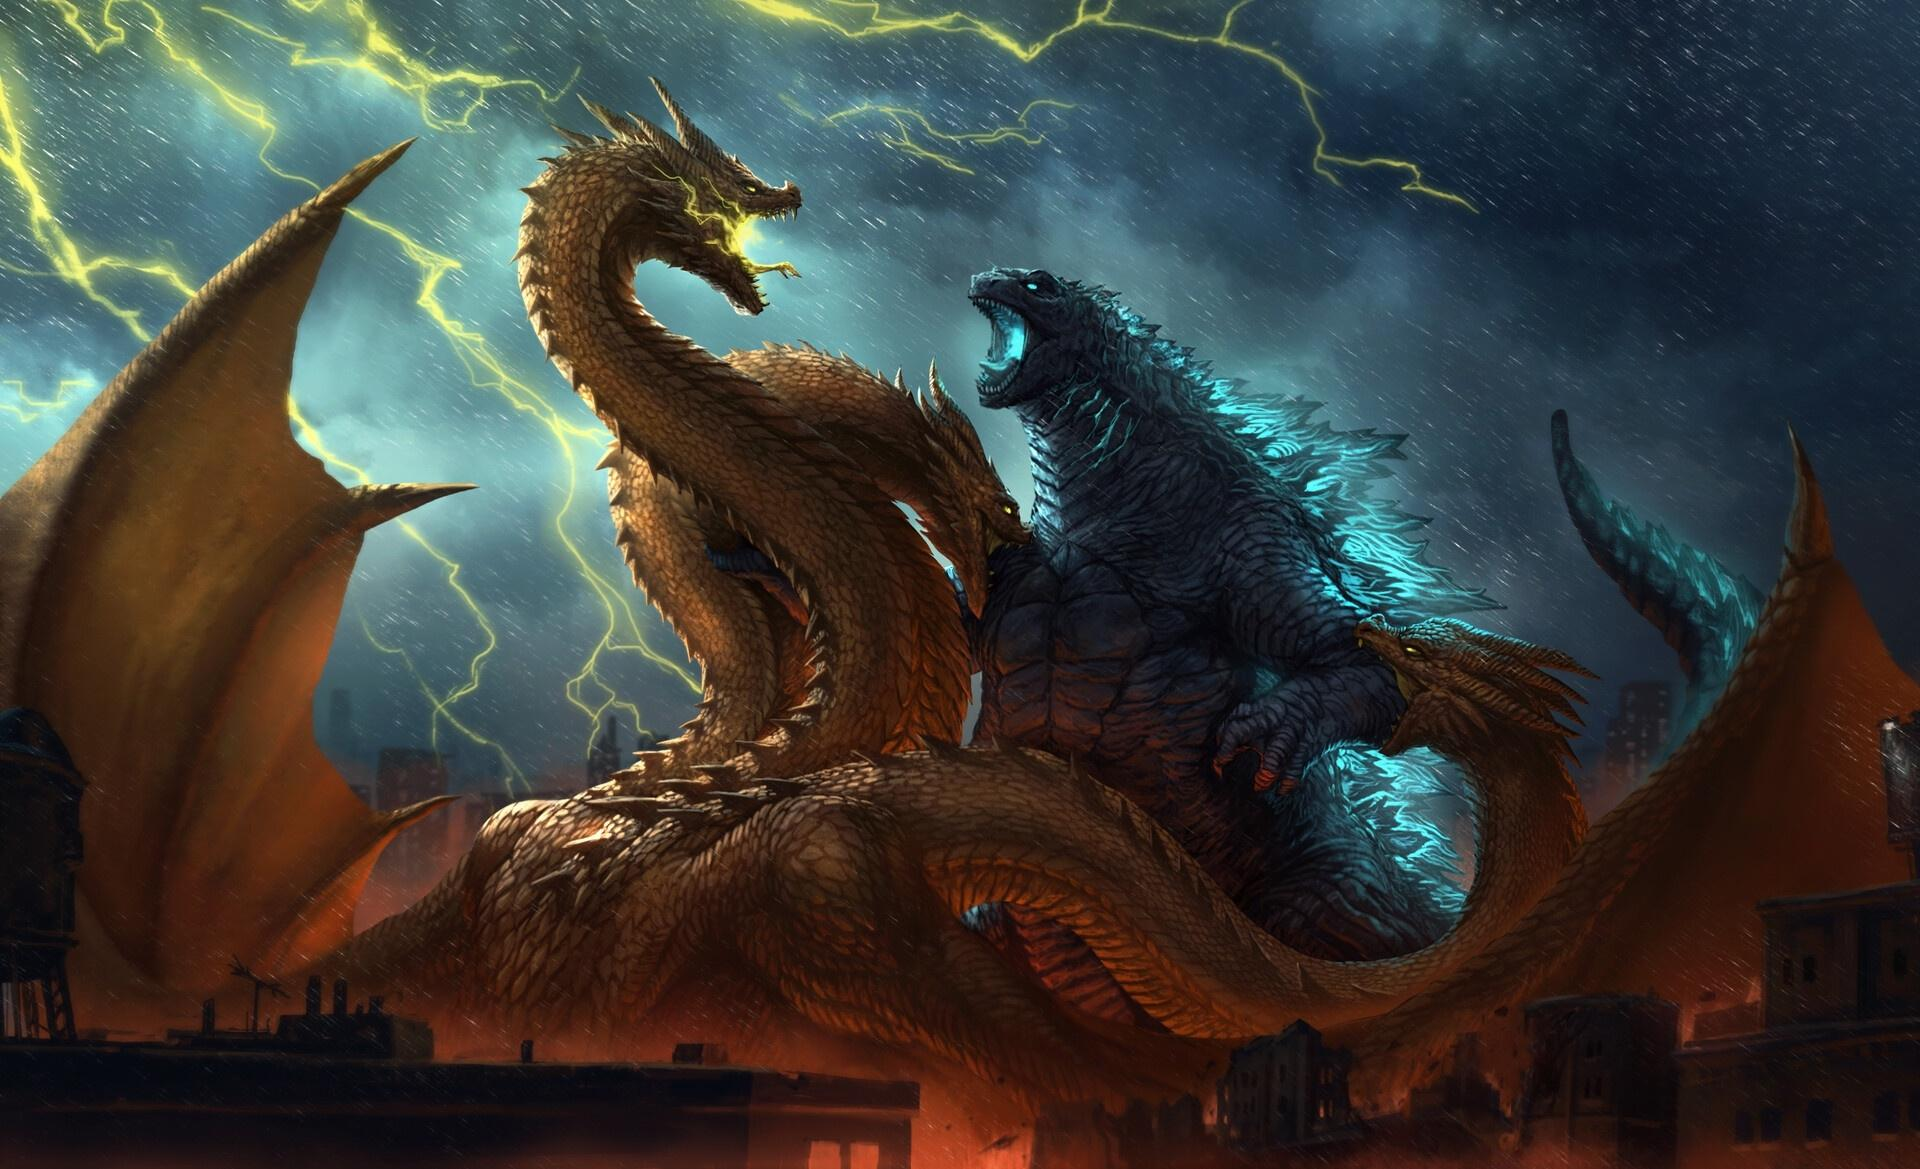 Godzilla Vs. King Ghidorah Wallpapers - Wallpaper Cave